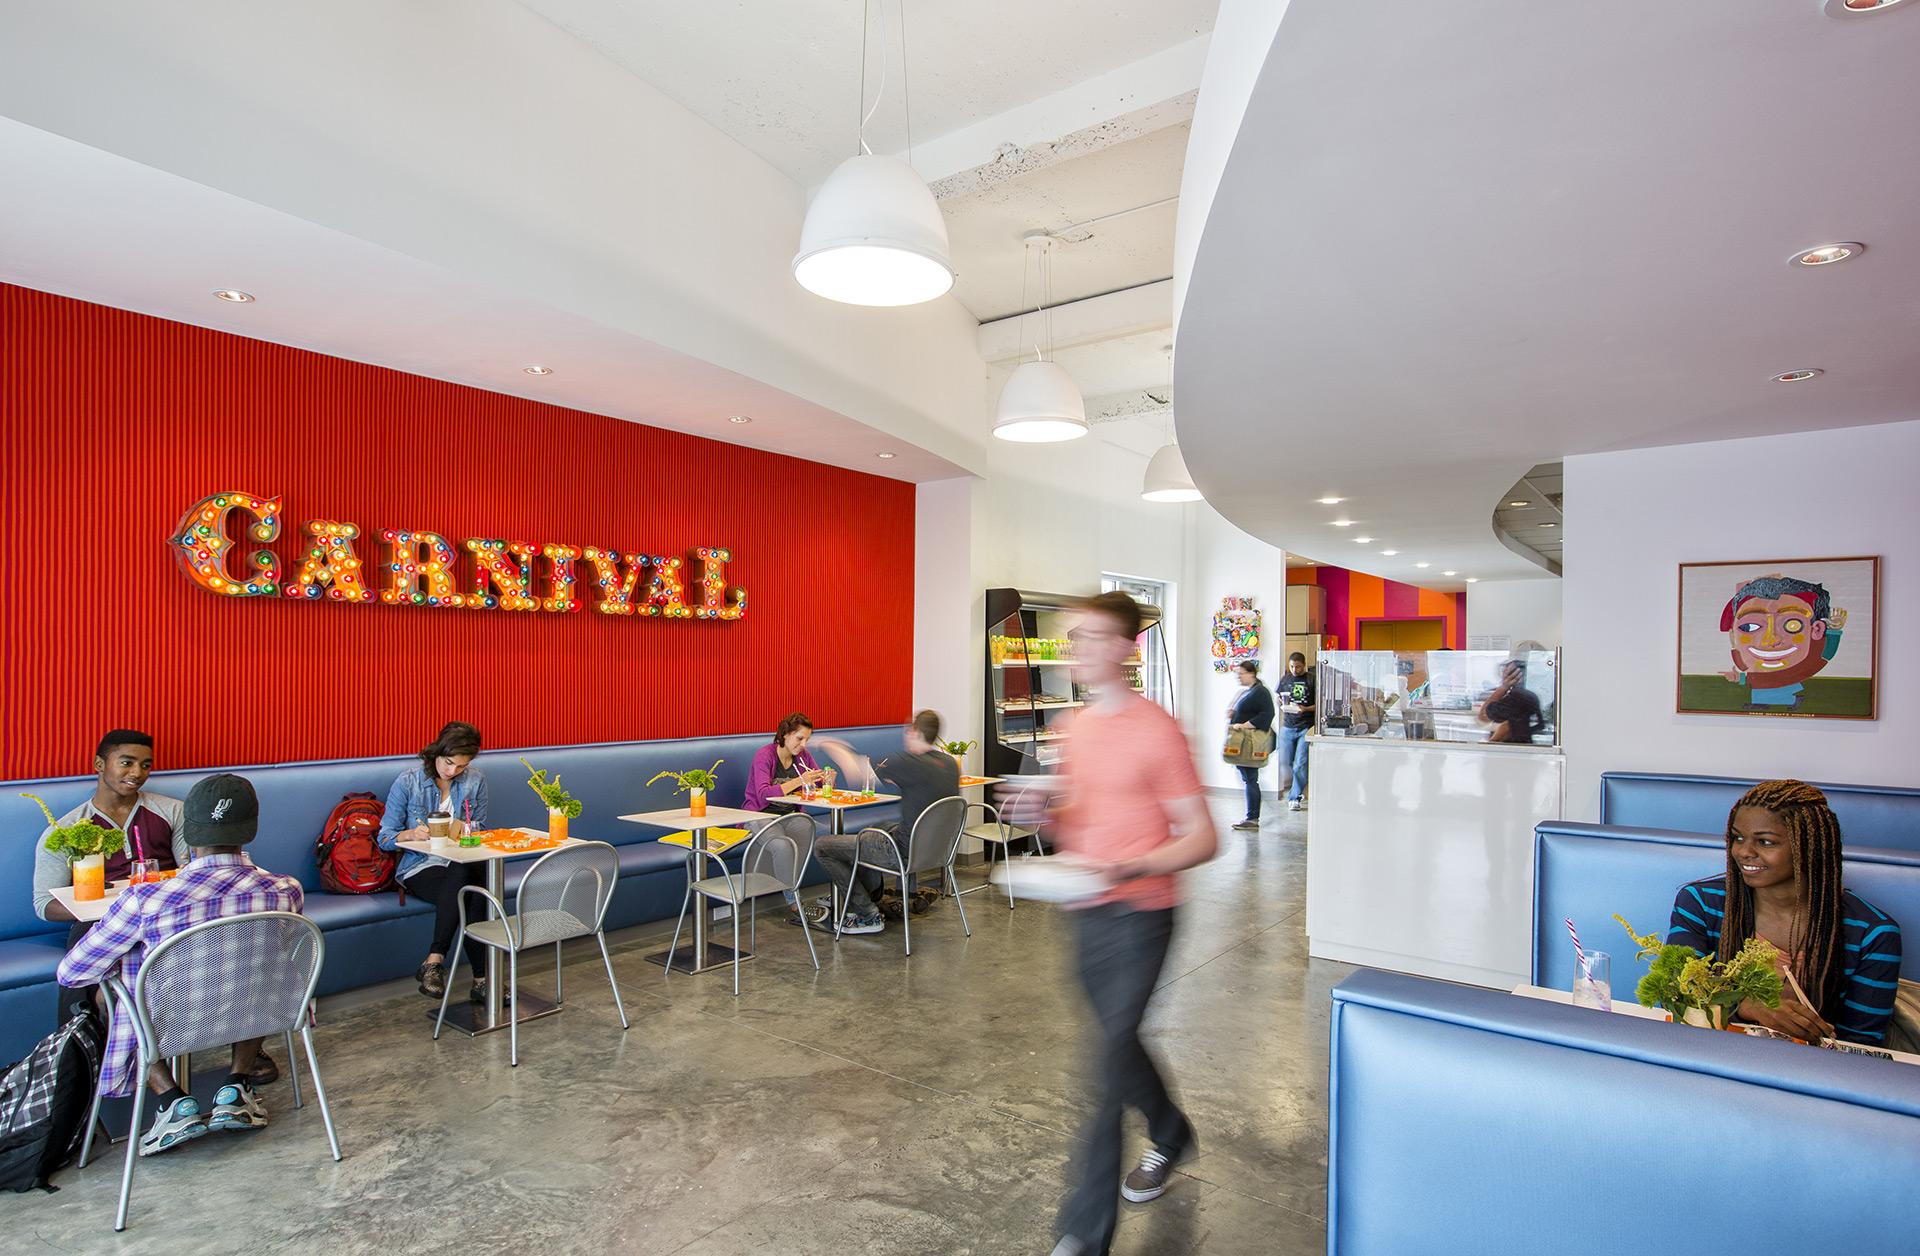 Carnival - Interior design colleges in atlanta ga ...